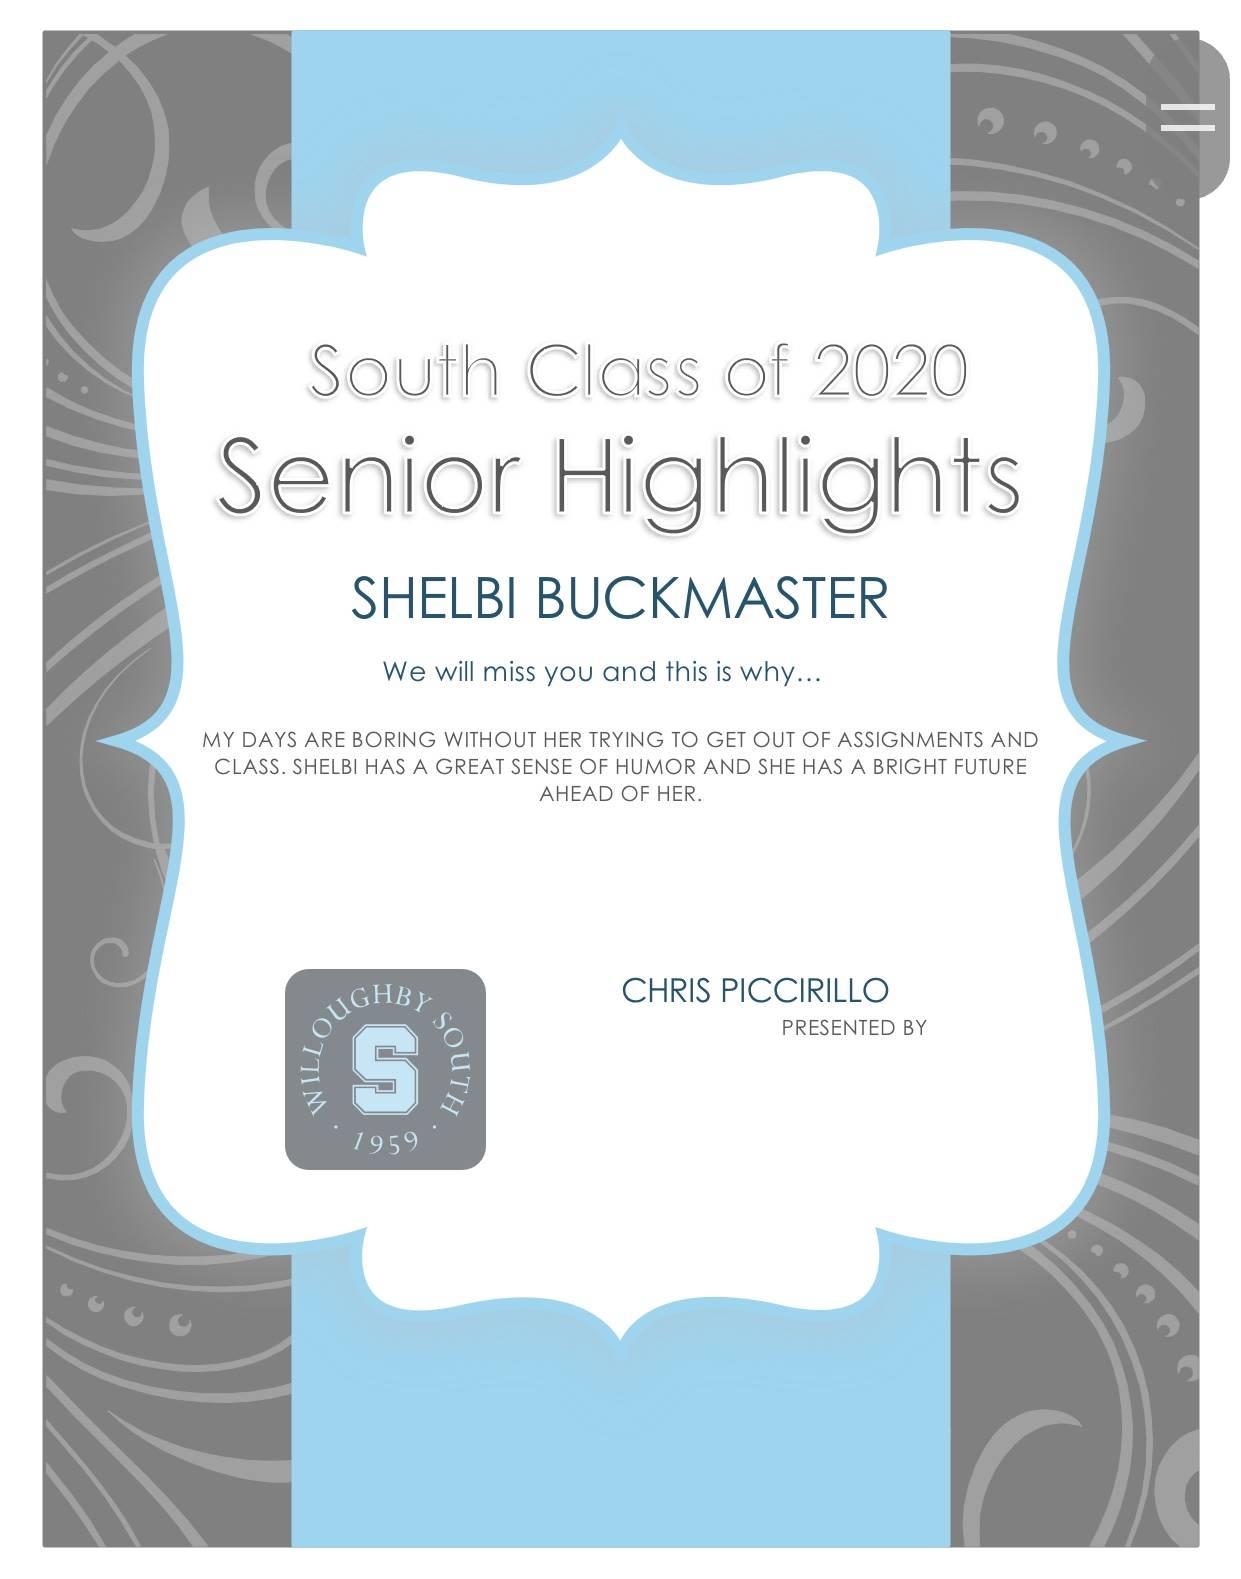 Shelbi Buckmaster